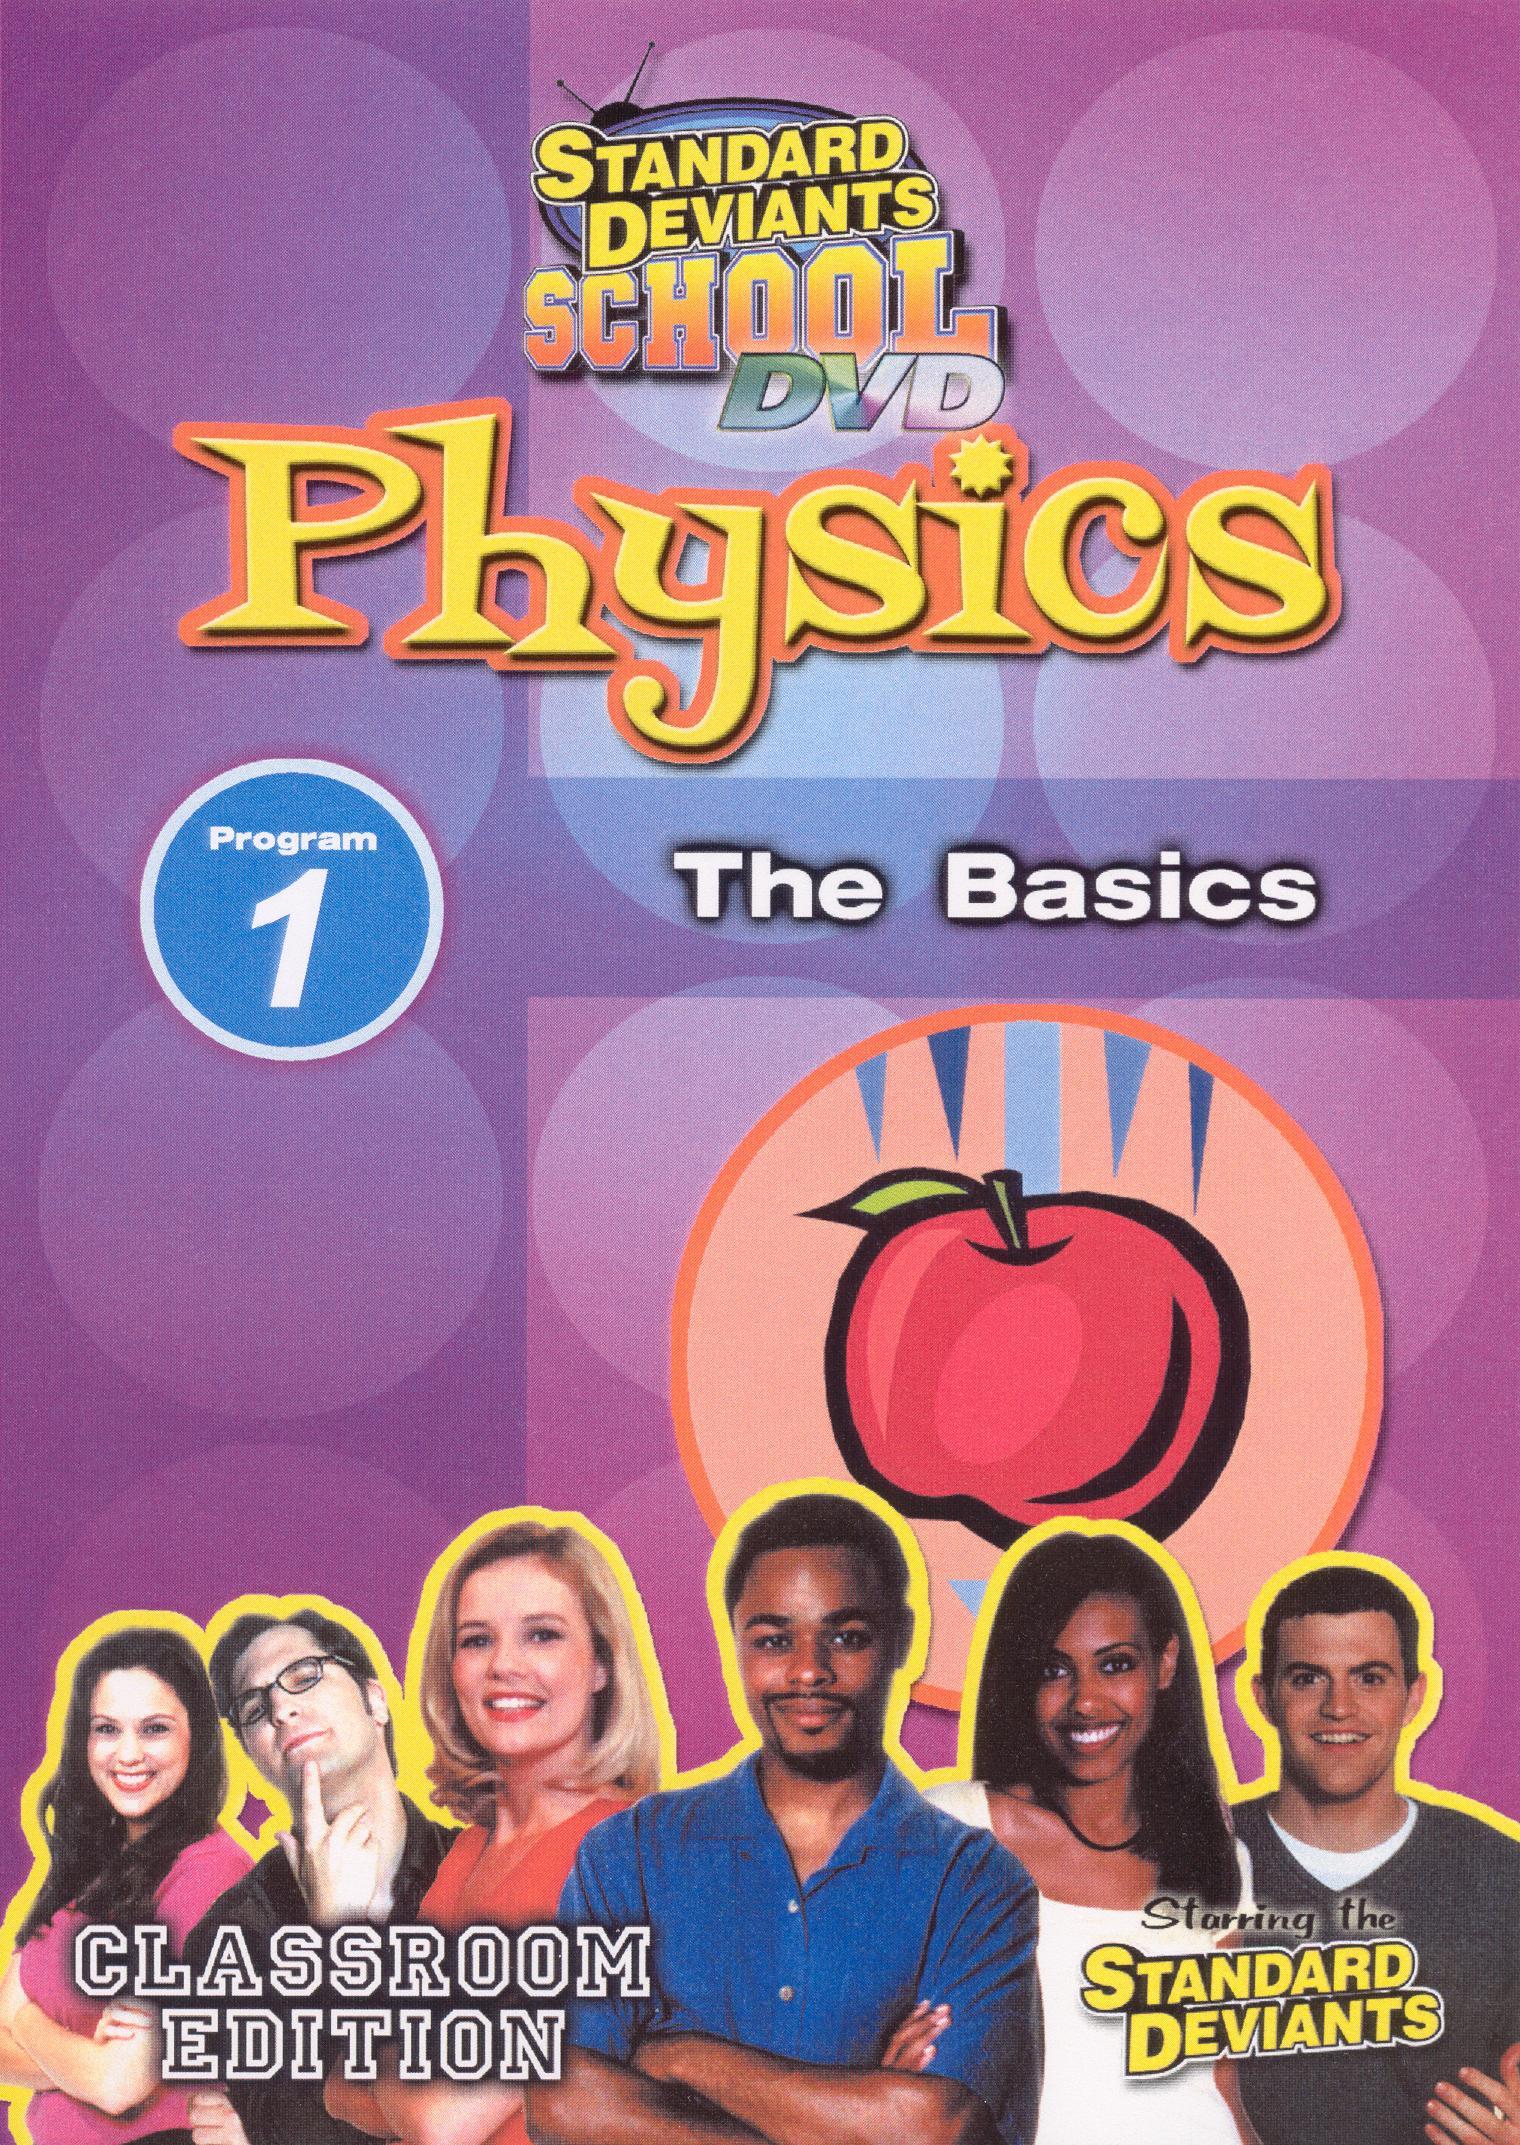 Standard Deviants School: Physics, Program 1 - The Basics